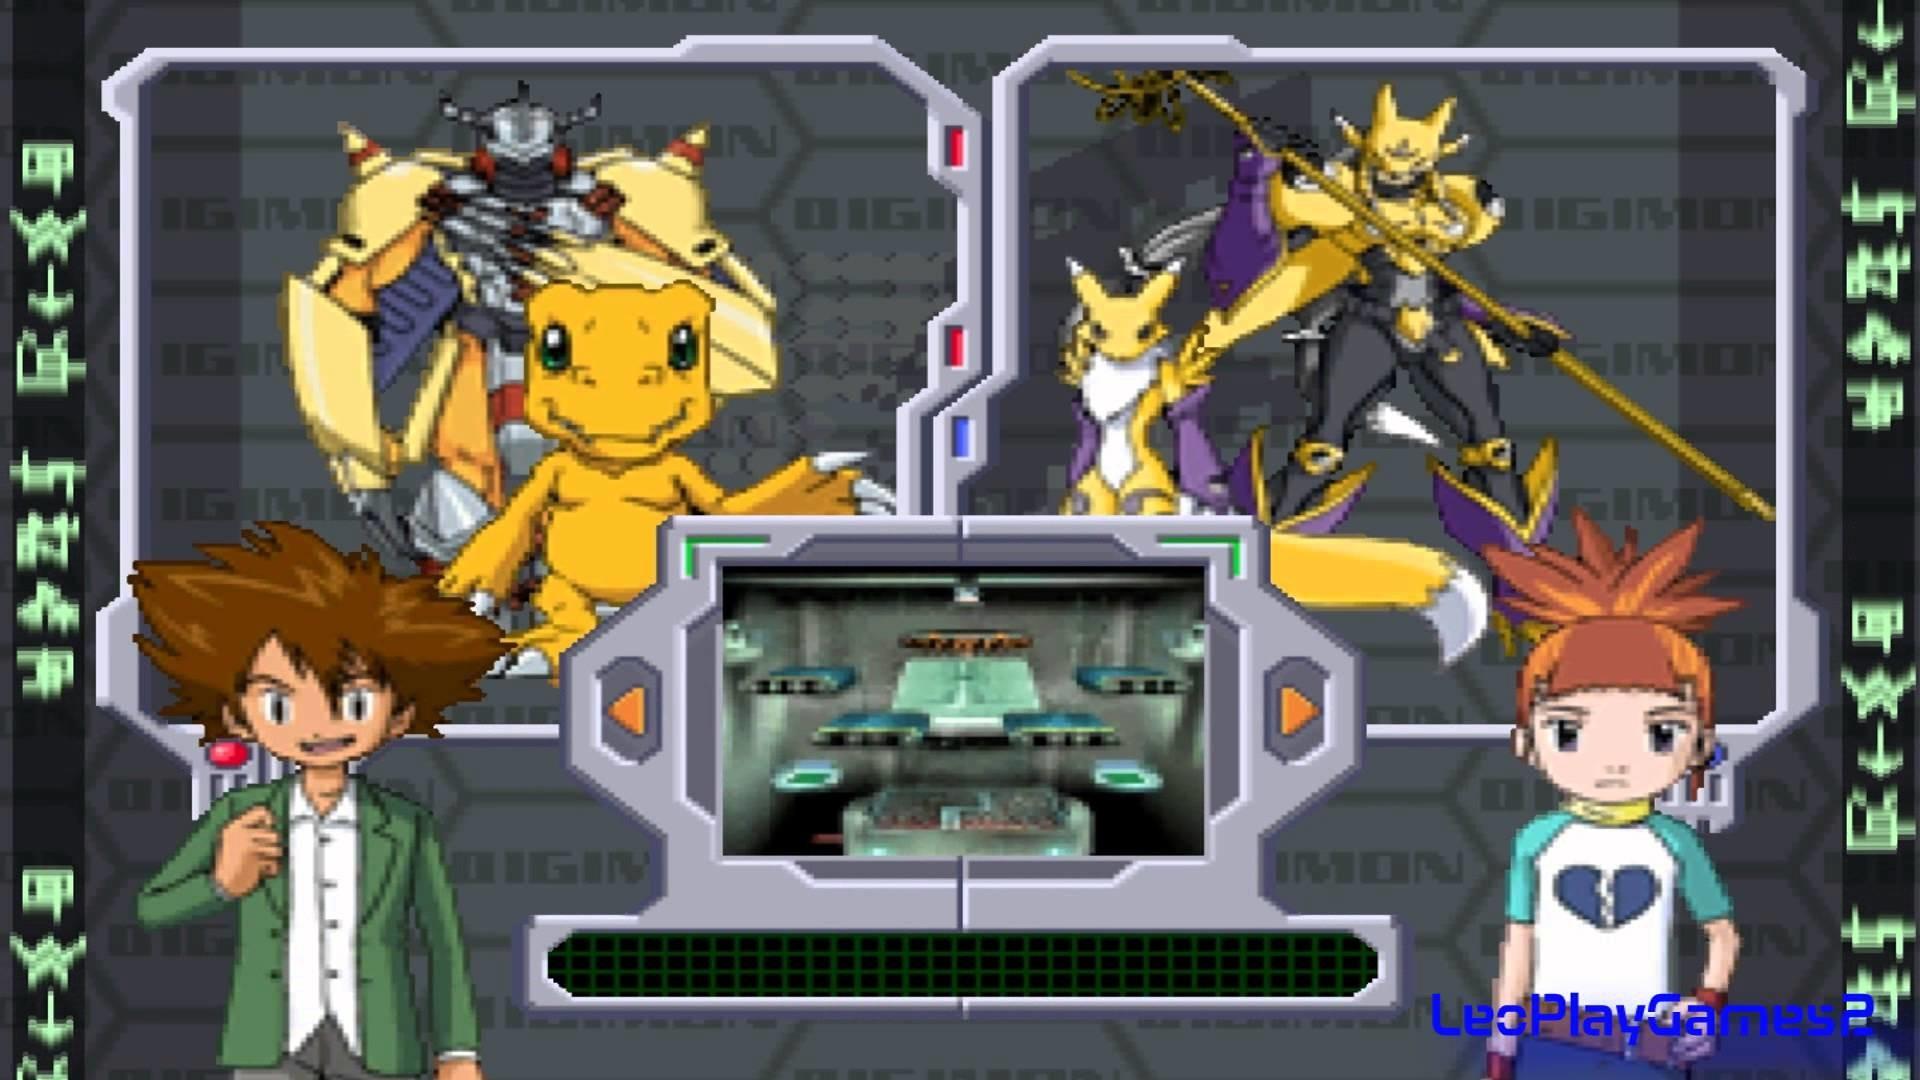 Res: 1920x1080, Digimon Rumble Arena Fight #1 Agumon Vs Renamon [PS1] 【Full HD】 - YouTube